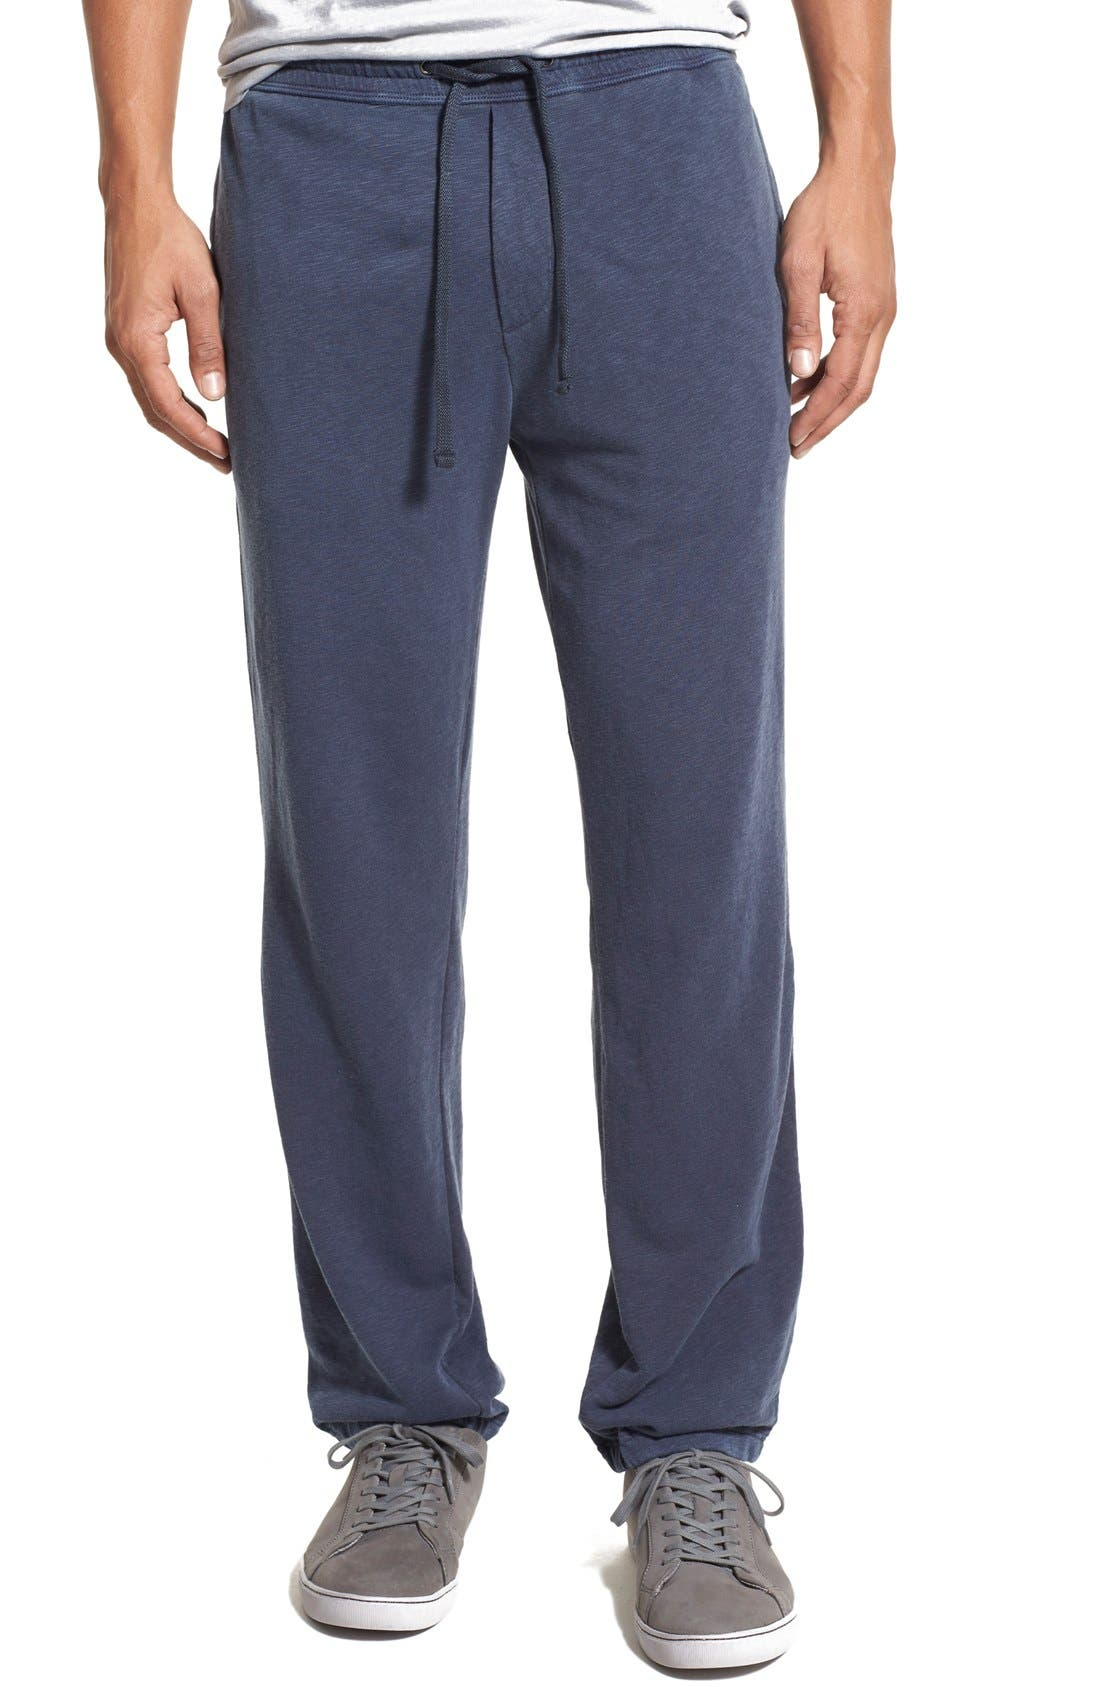 James Perse 'Classic' Sweatpants